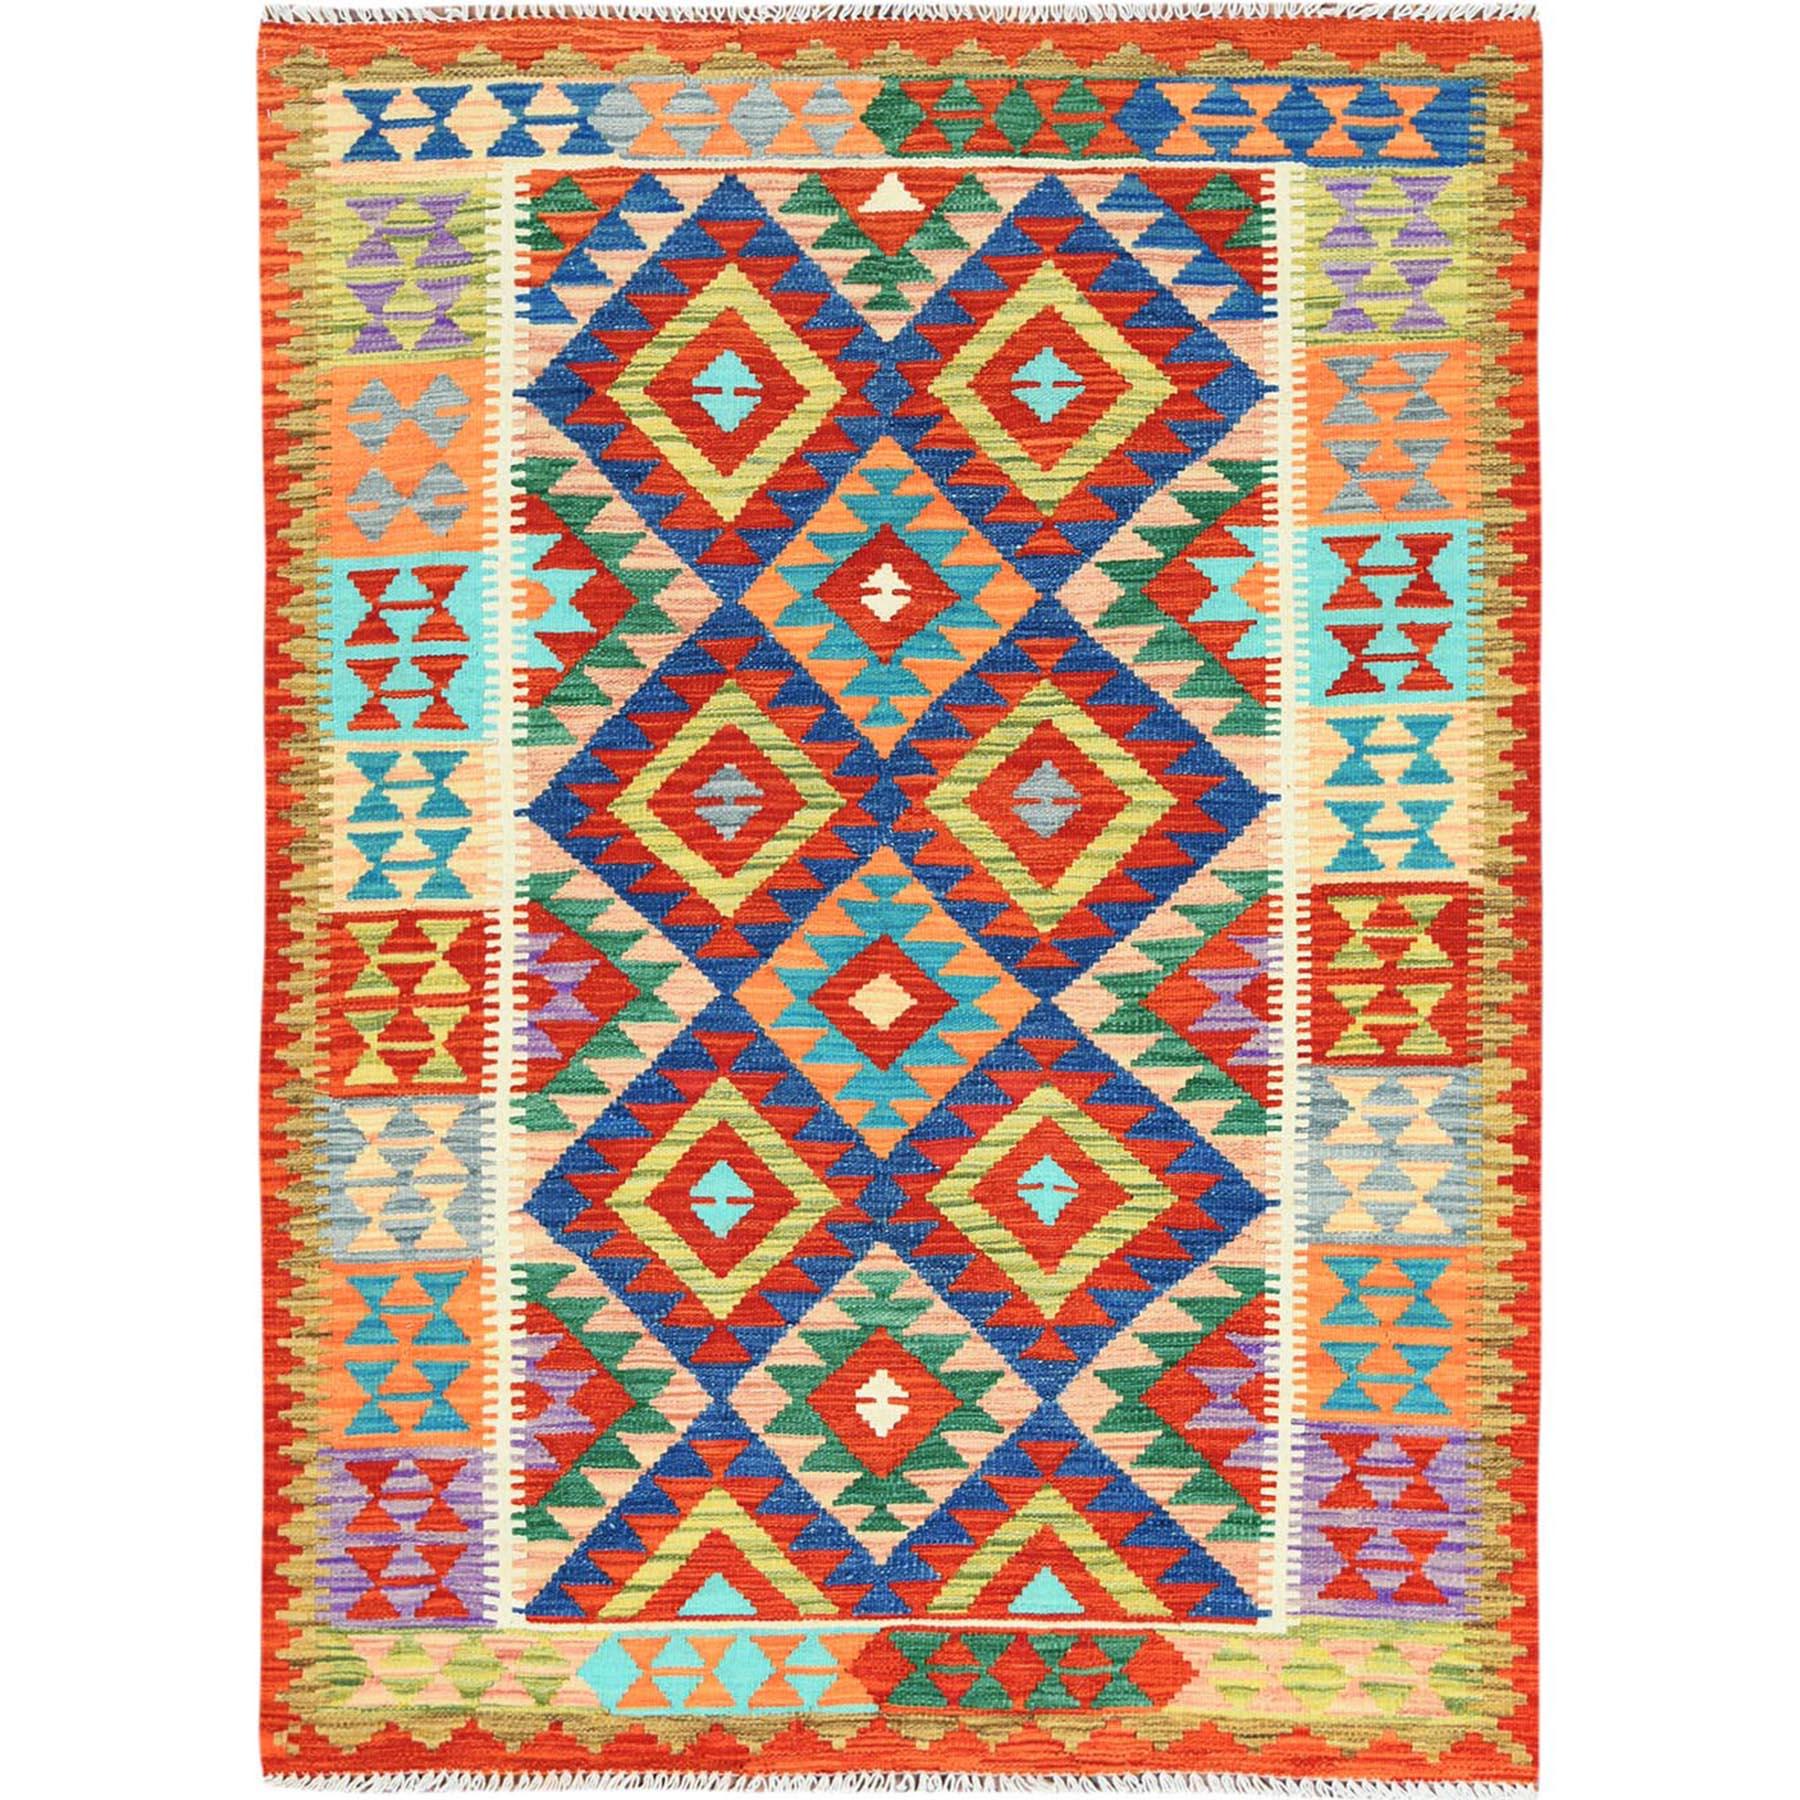 Colorful Afghan Kilim Geometric Design Flat Weave Reversible Vibrant Wool Hand Woven Oriental Rug